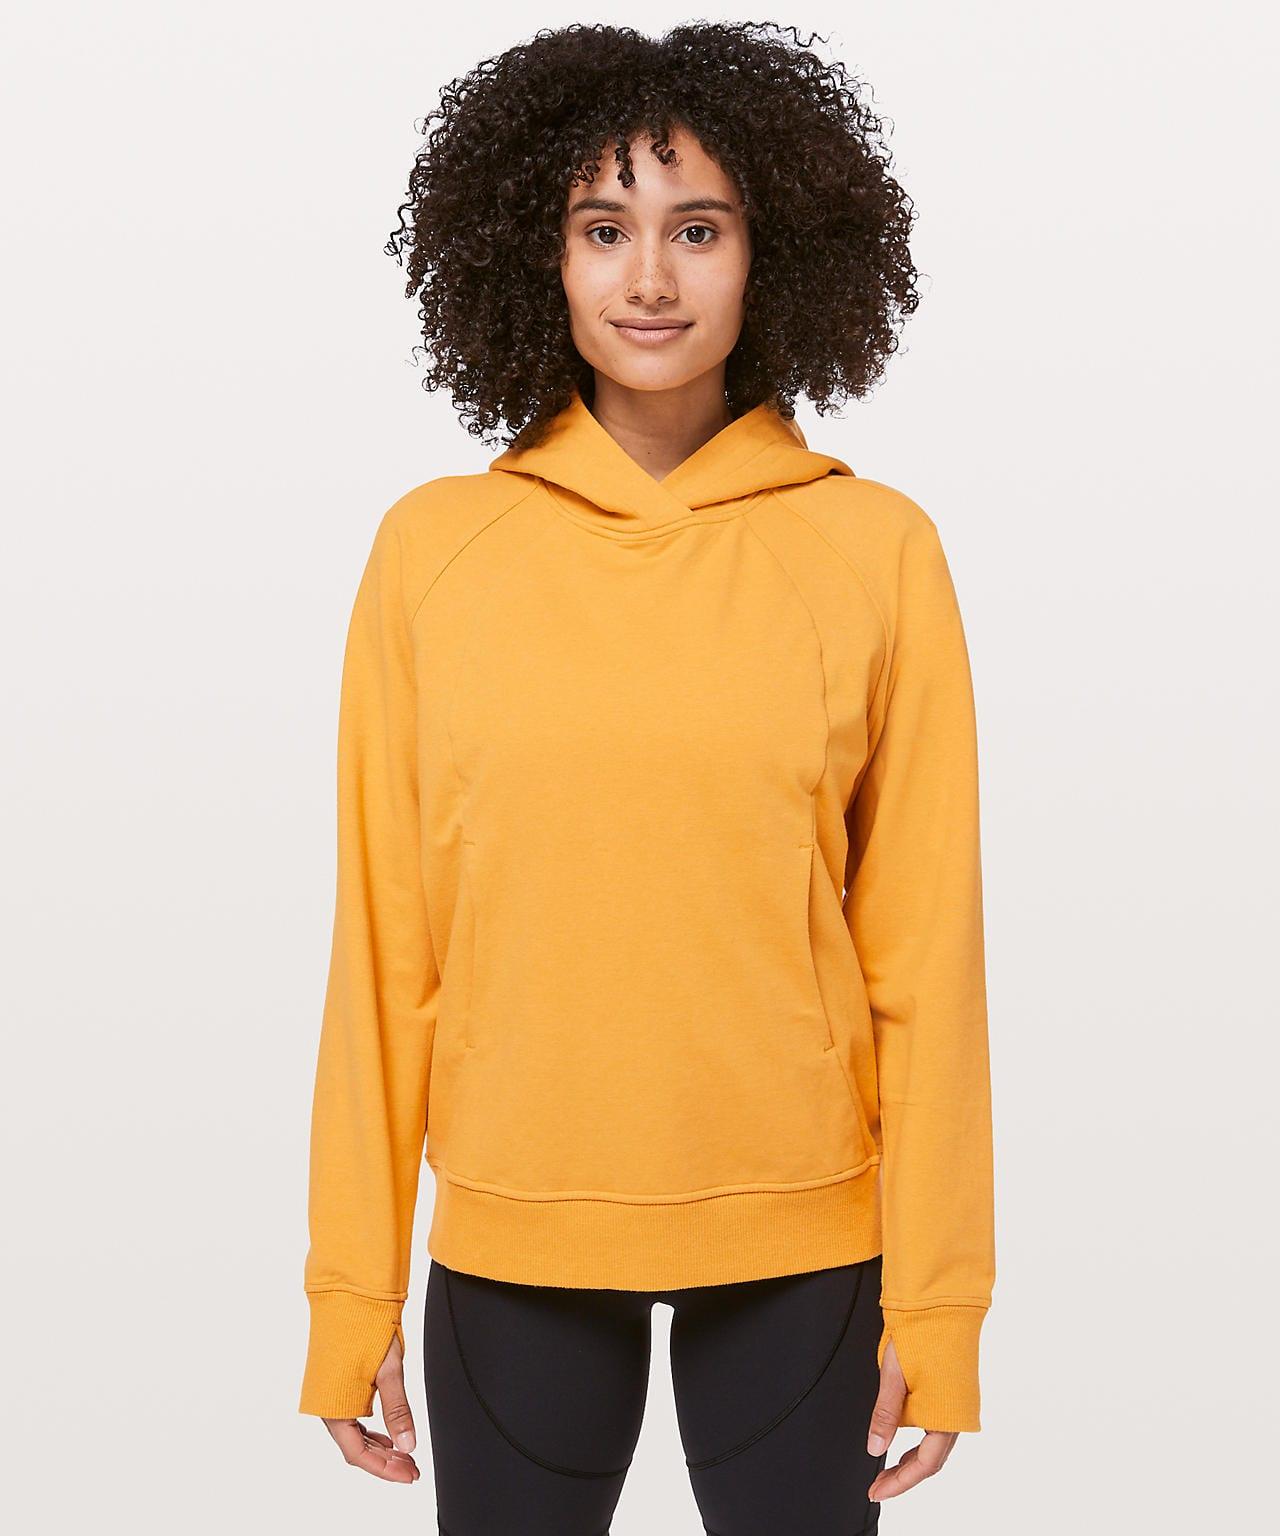 Scuba Pullover, heathered honey lemon, Lululemon Upload